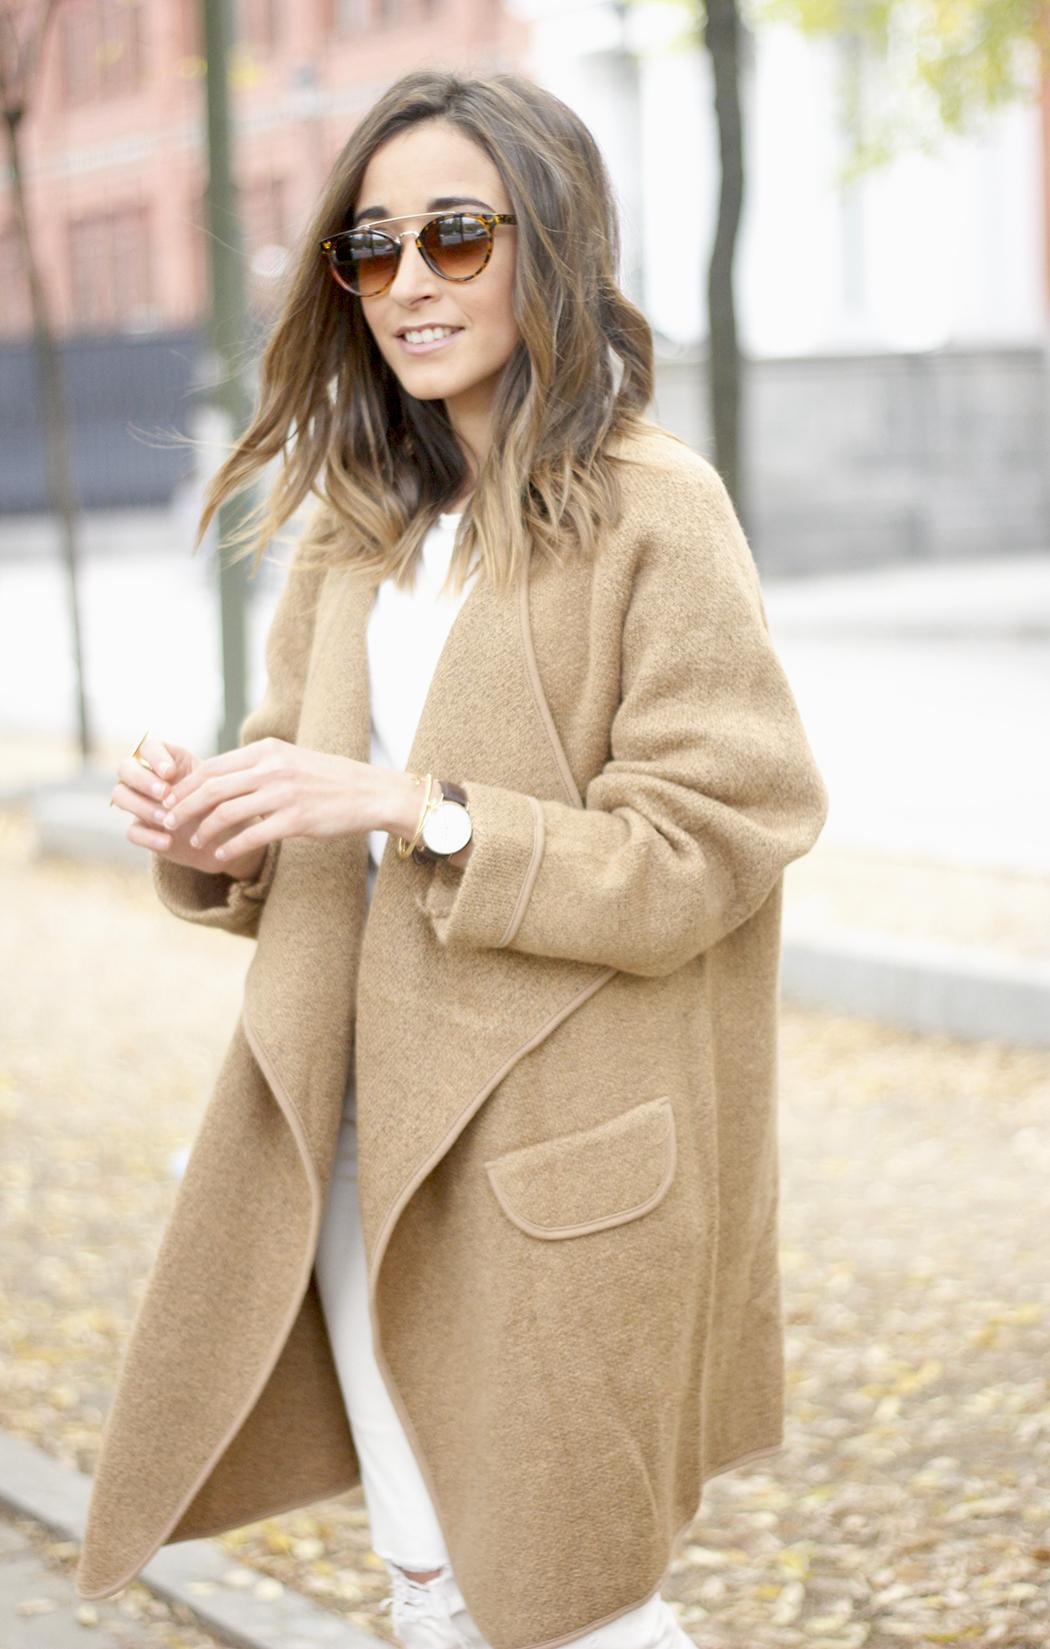 Camel Coat sheinside white outfit heels uterqüe purse outfit13